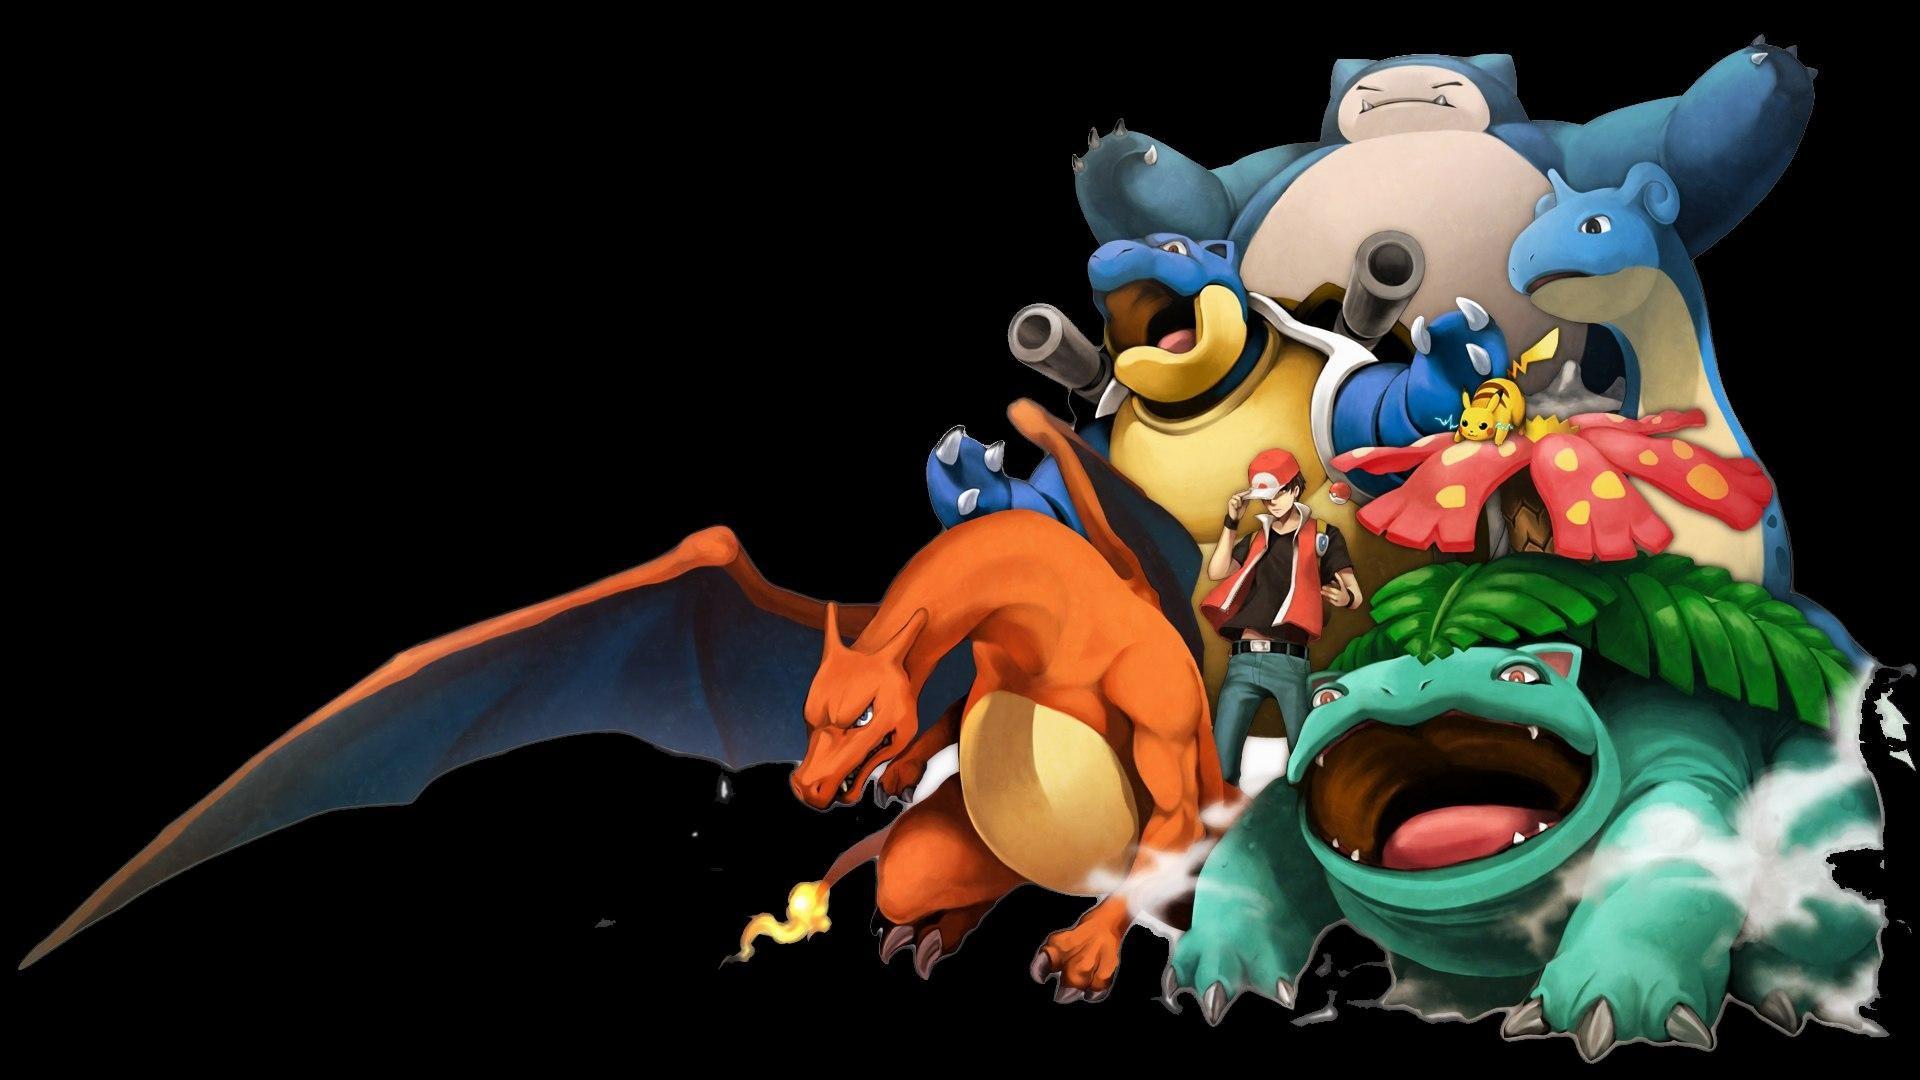 wallpaper.wiki-All-Pokemon-Image-PIC-WPC005242